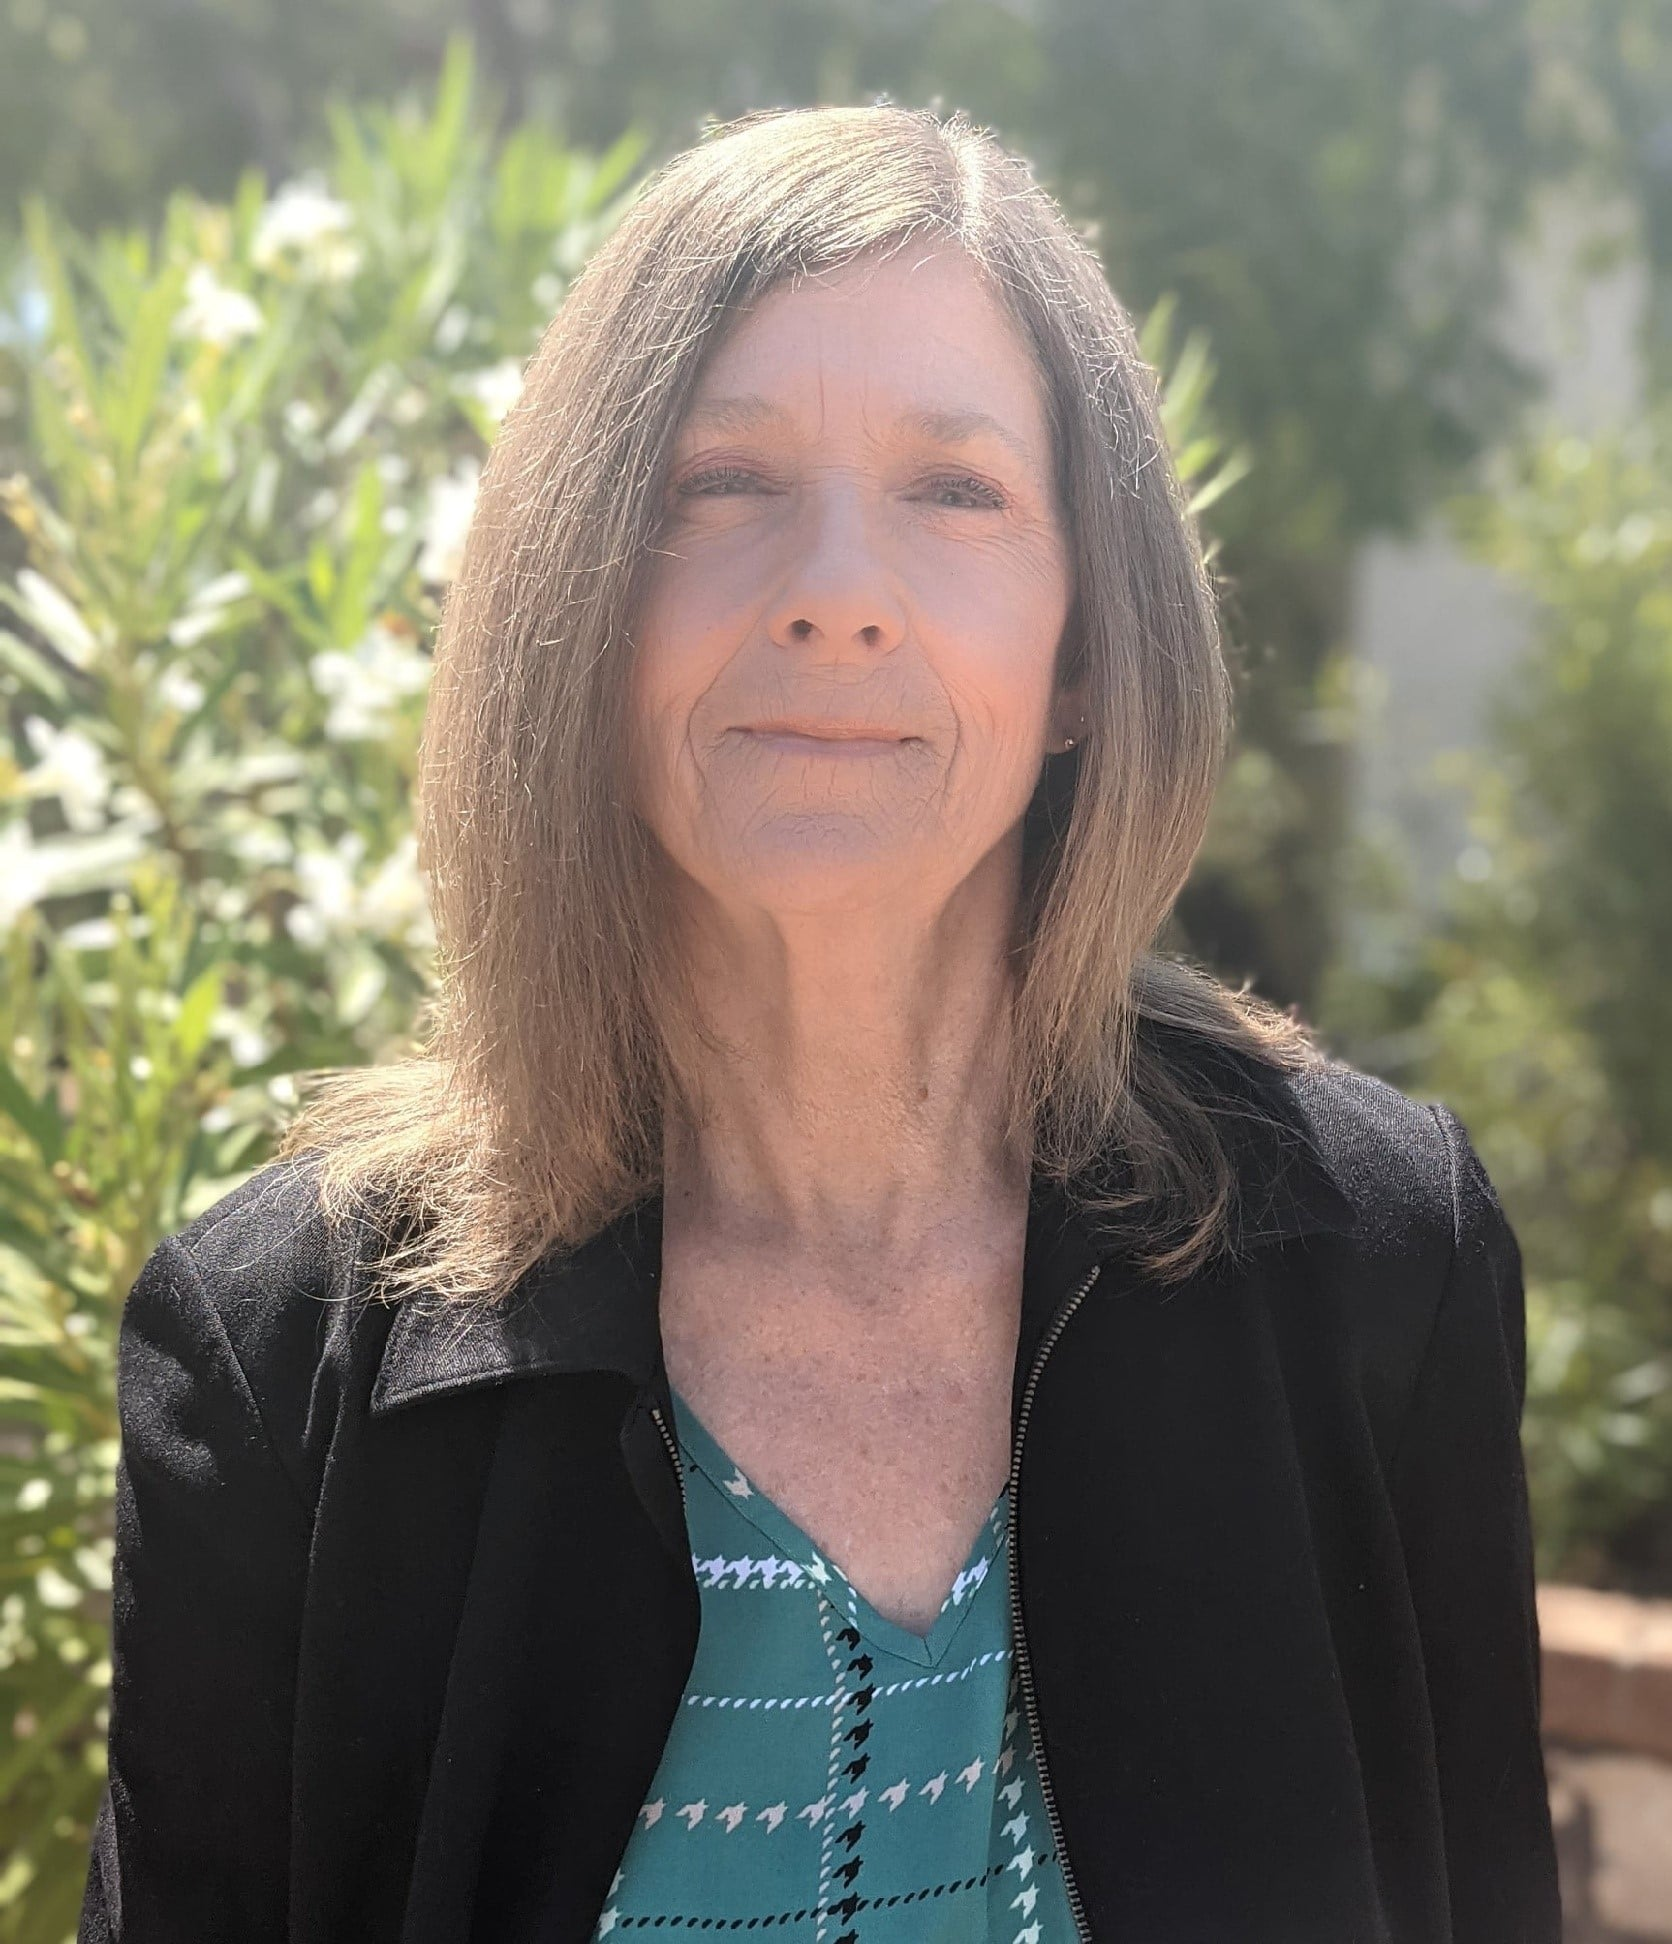 Community Options Executive Director Robin Ratcliff